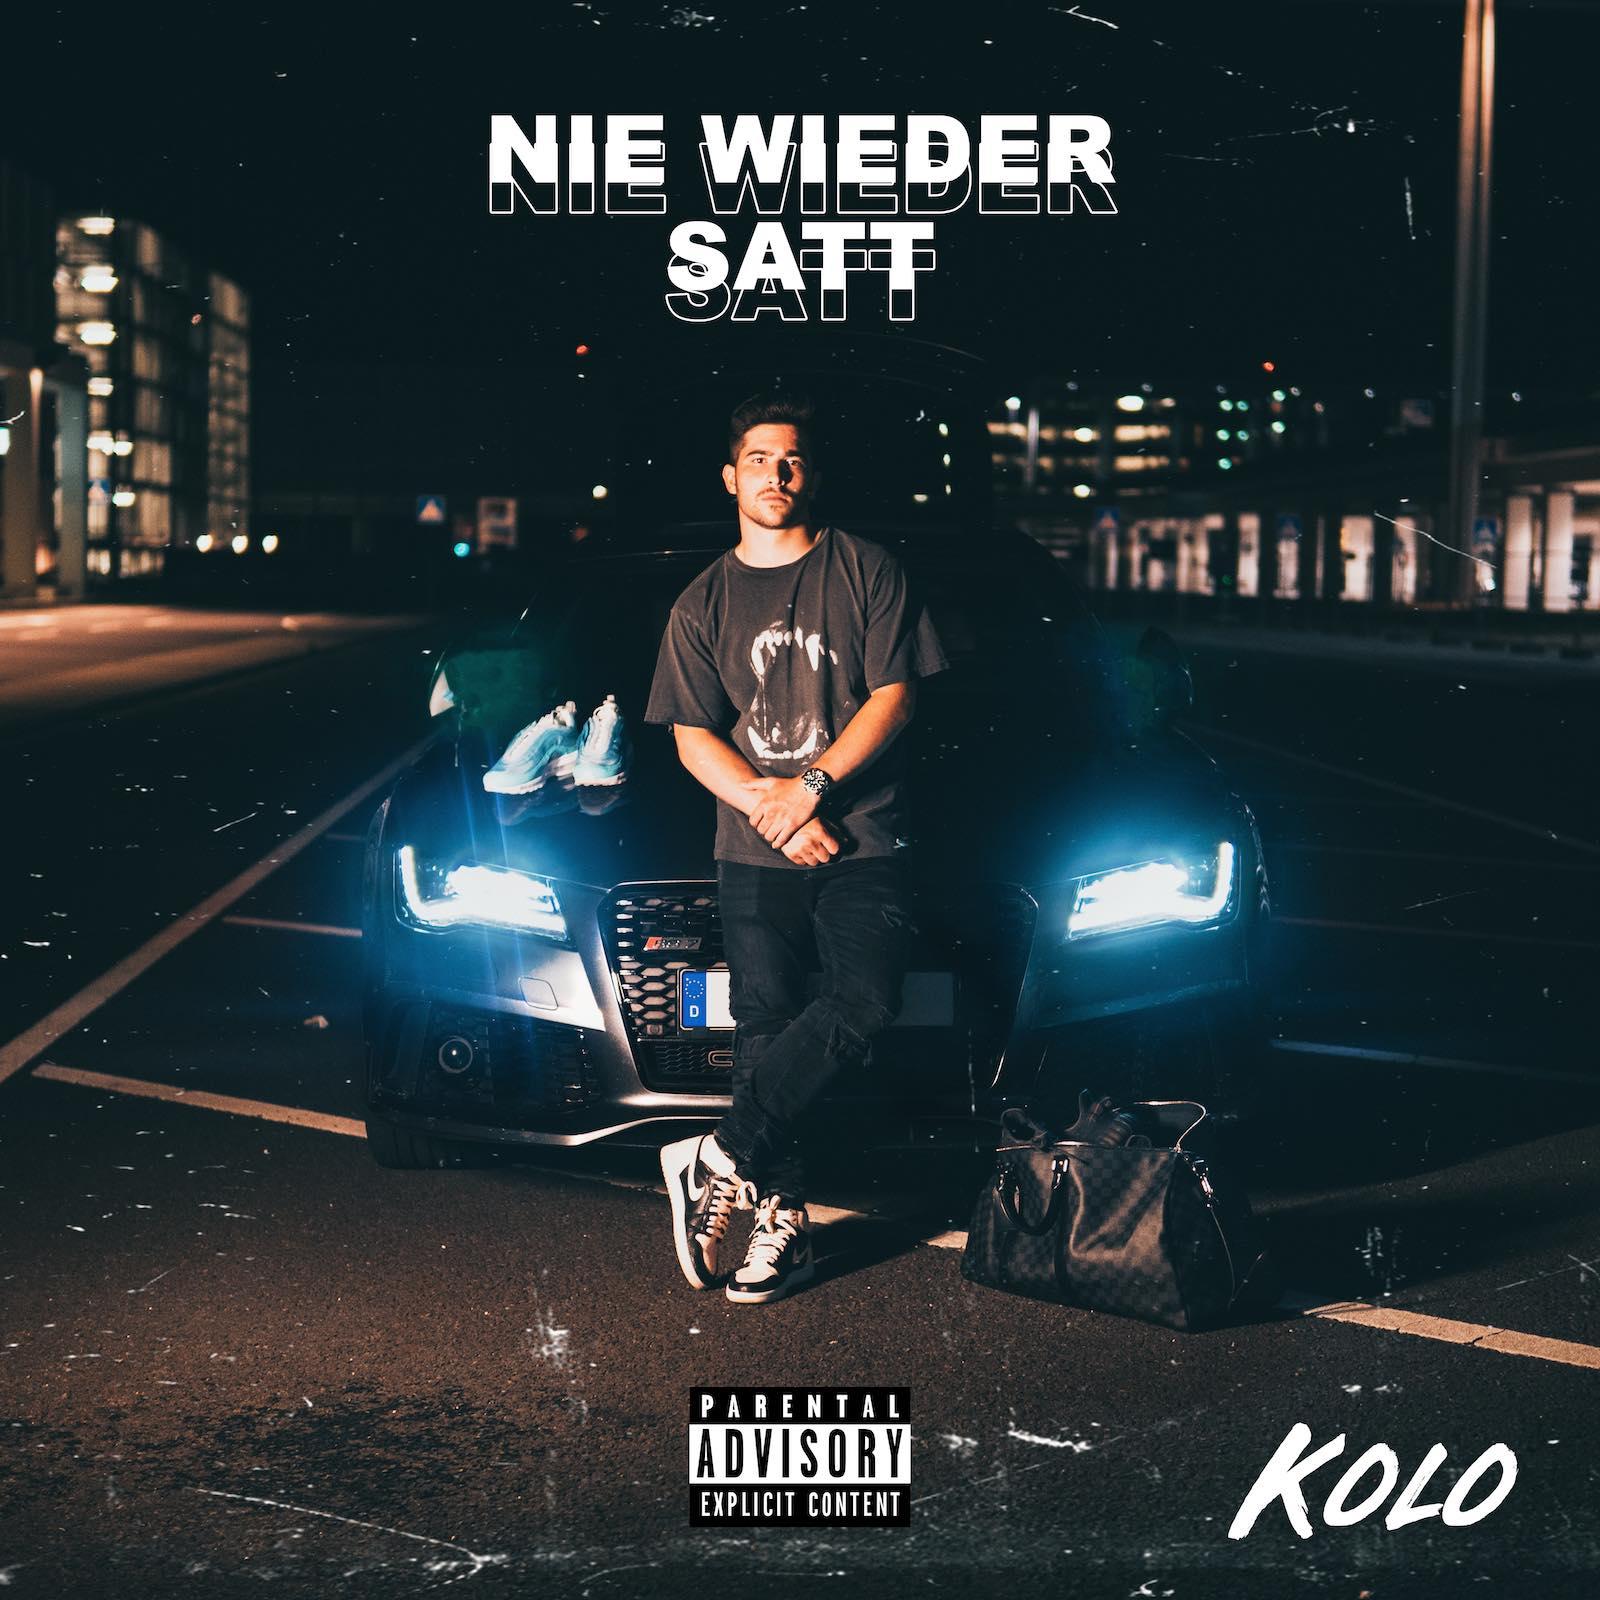 Upcoming: KOLO - Nie Wieder Satt